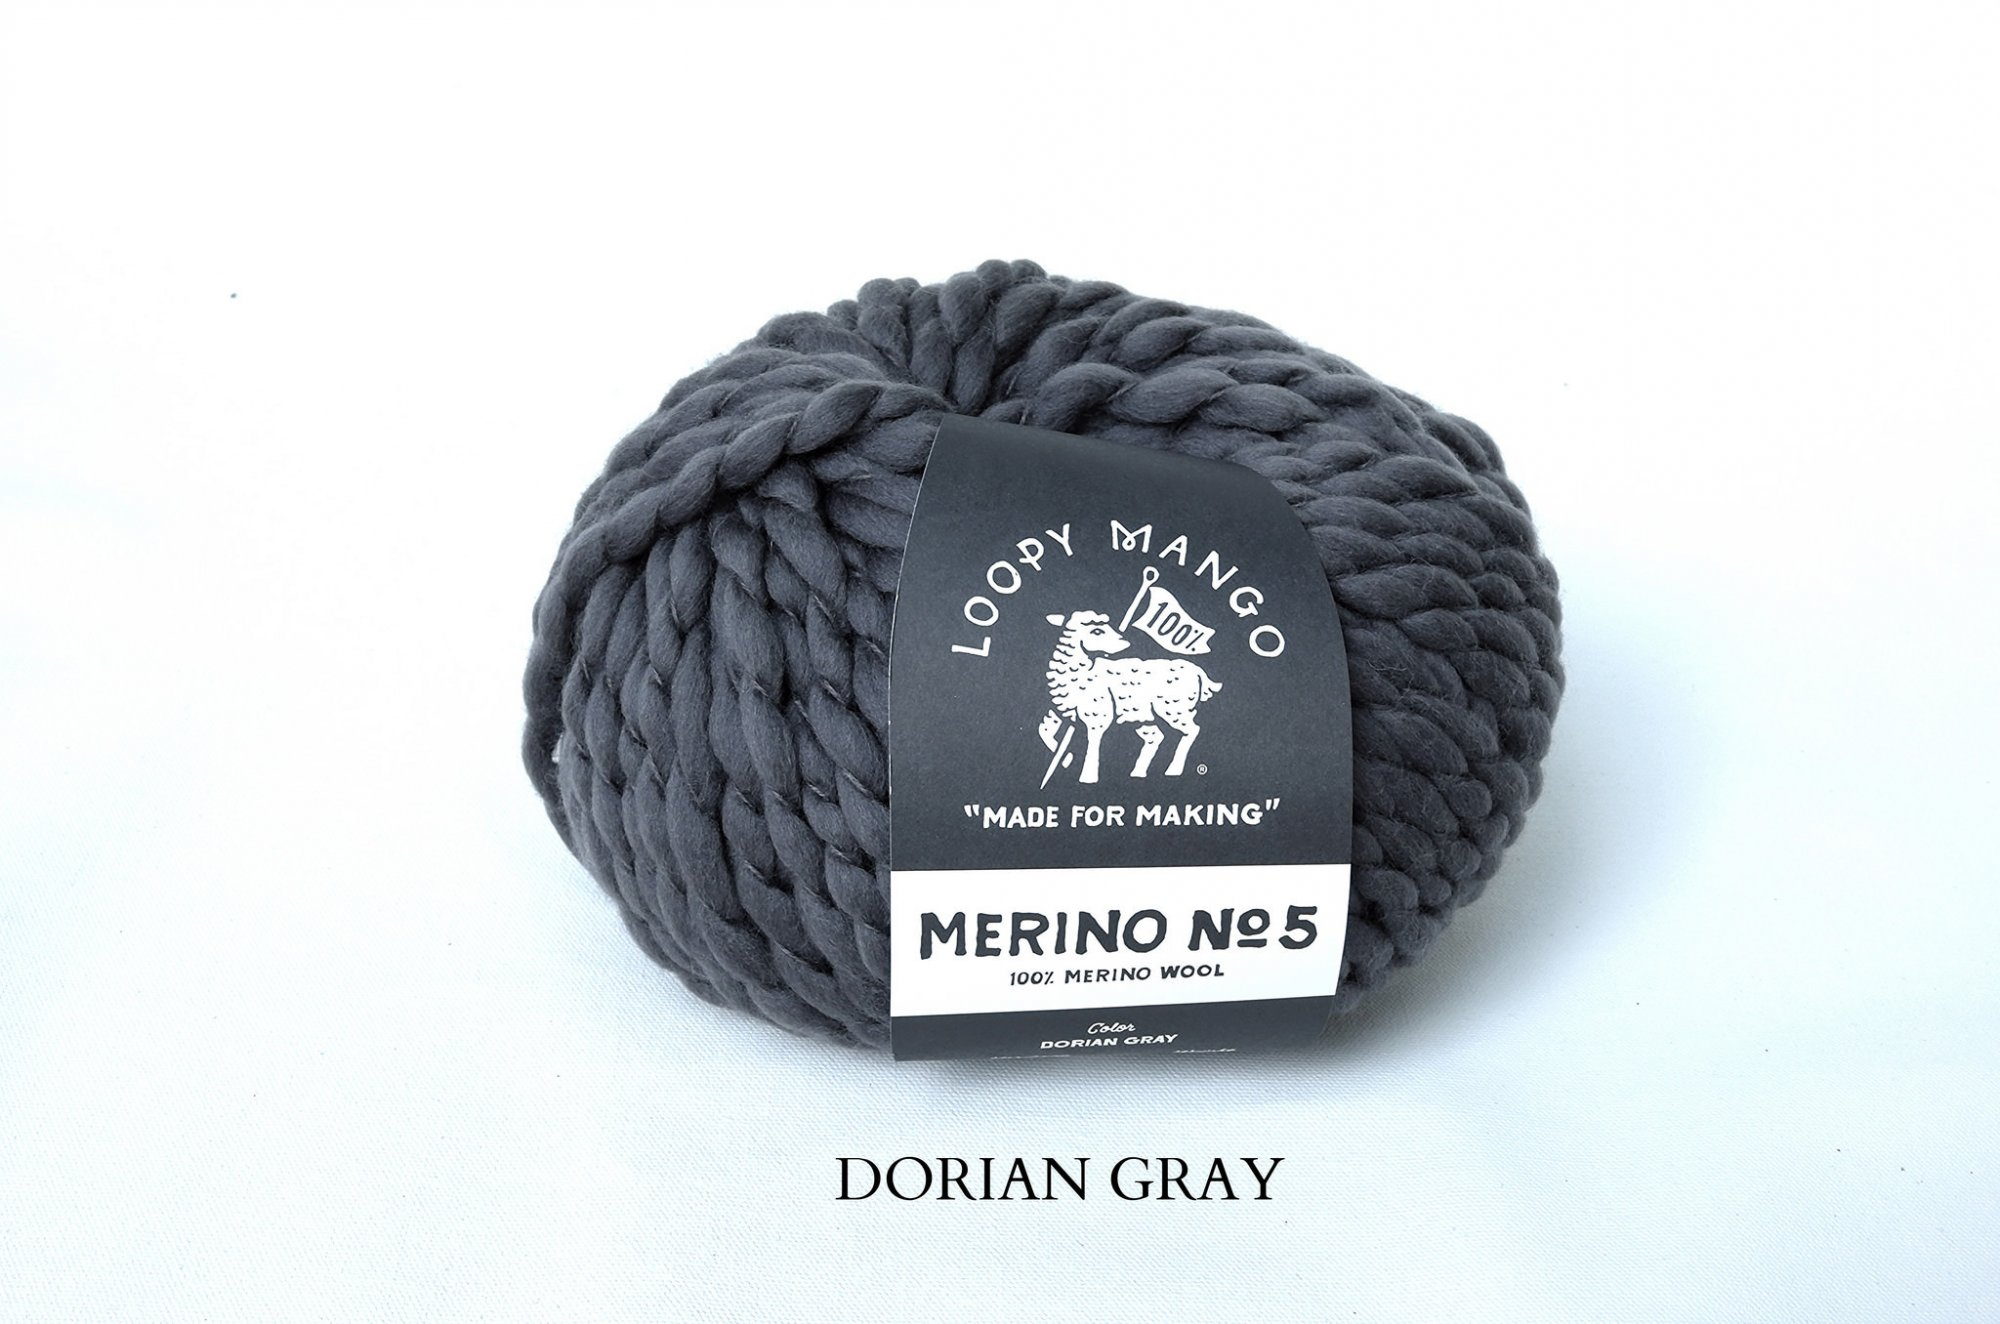 Loopy Mango - Merino No 5 Wool - Dorian Gray - 150g - 68m